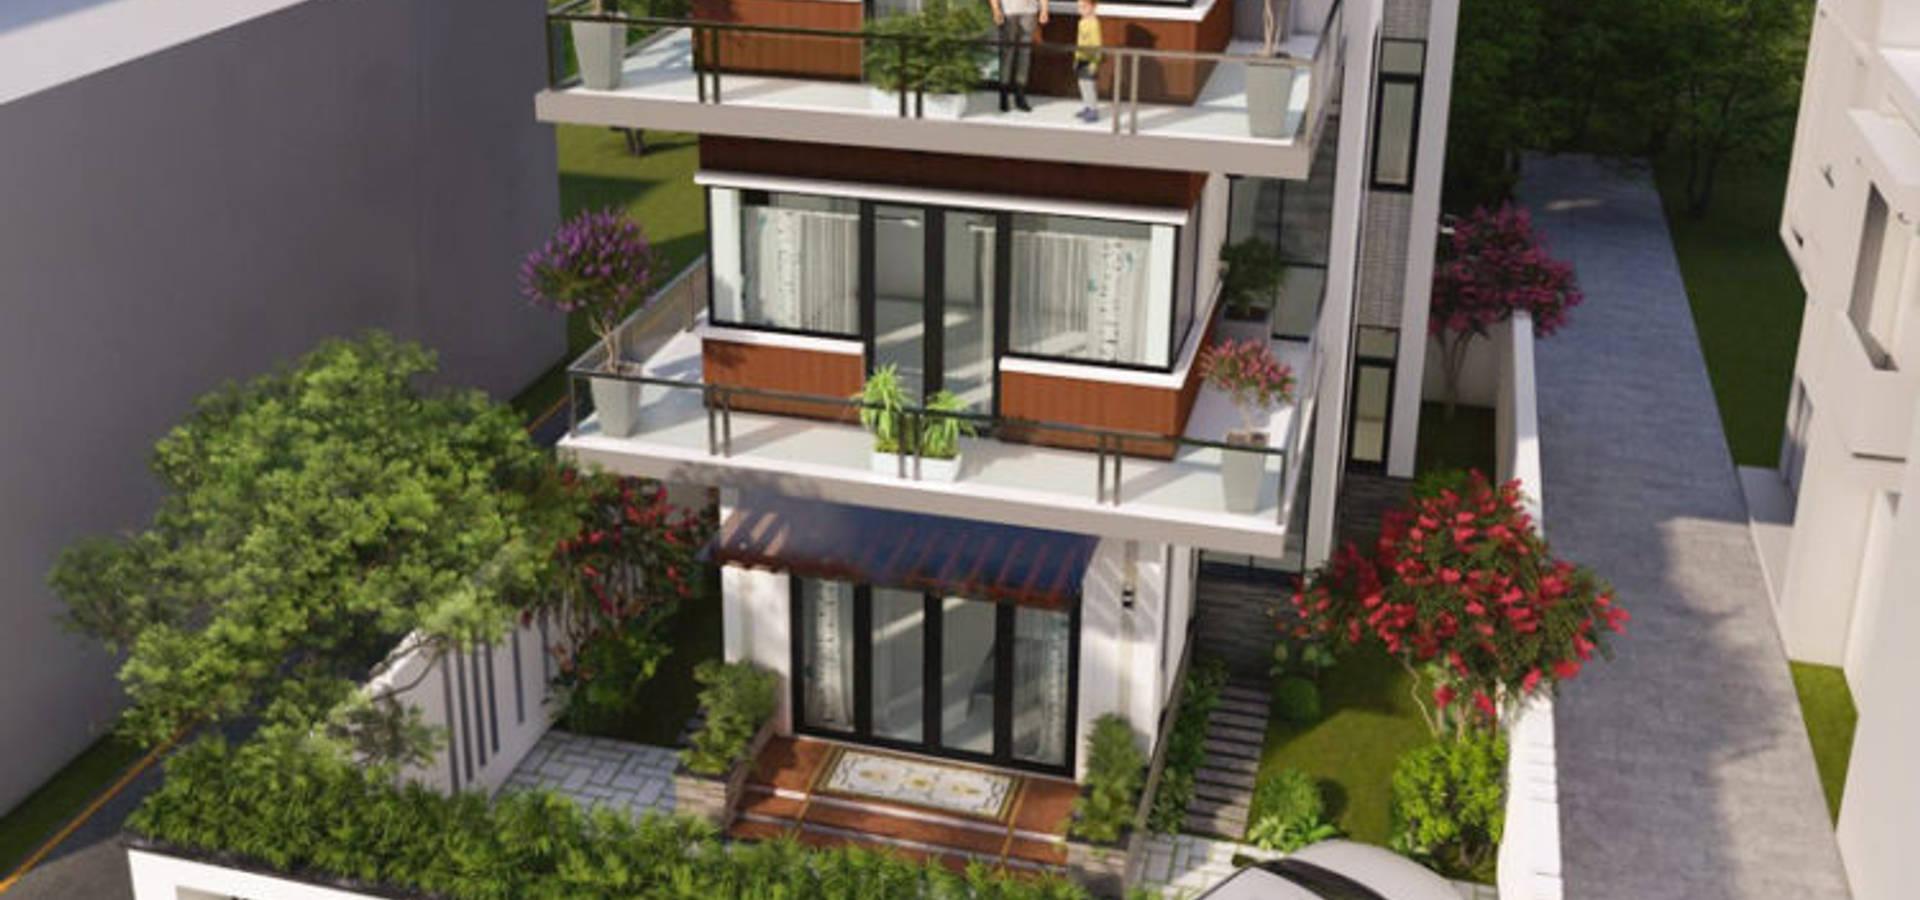 Kiến trúc Trang Kim